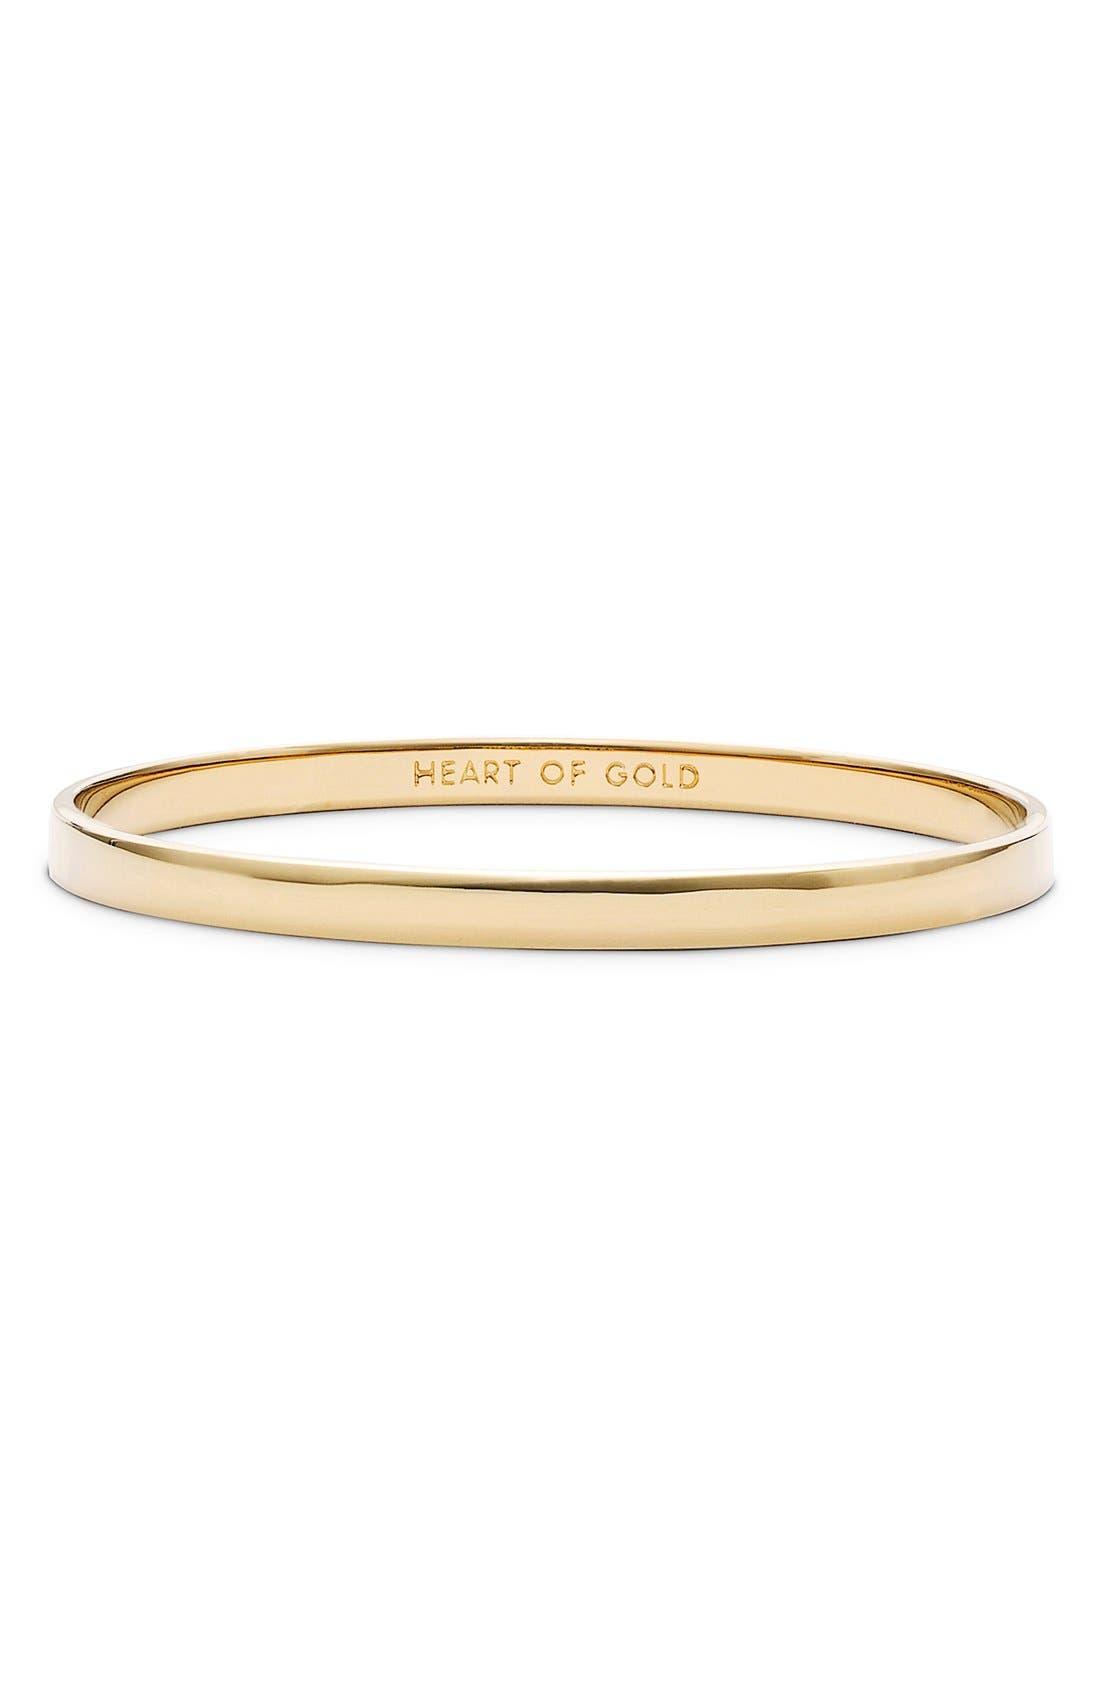 kate spade new york 'idiom - heart of gold' bangle